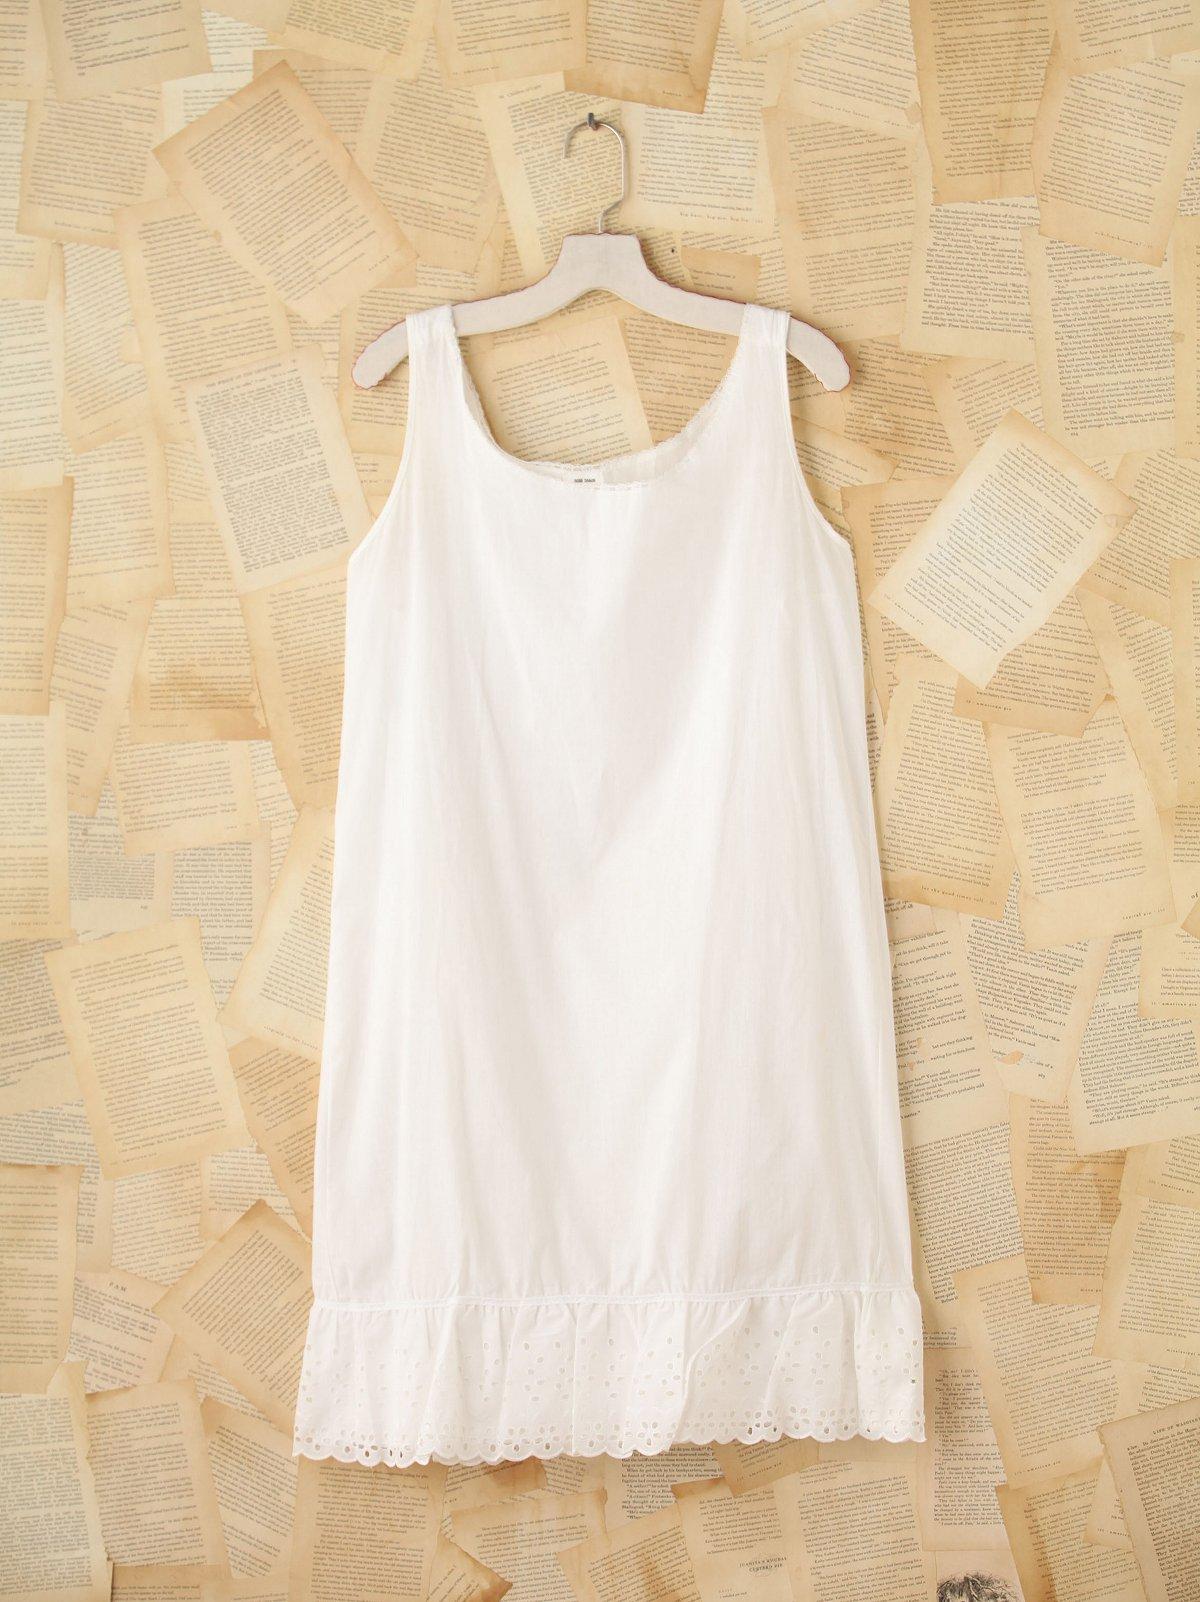 Vintage Lace Sleeveless Dress